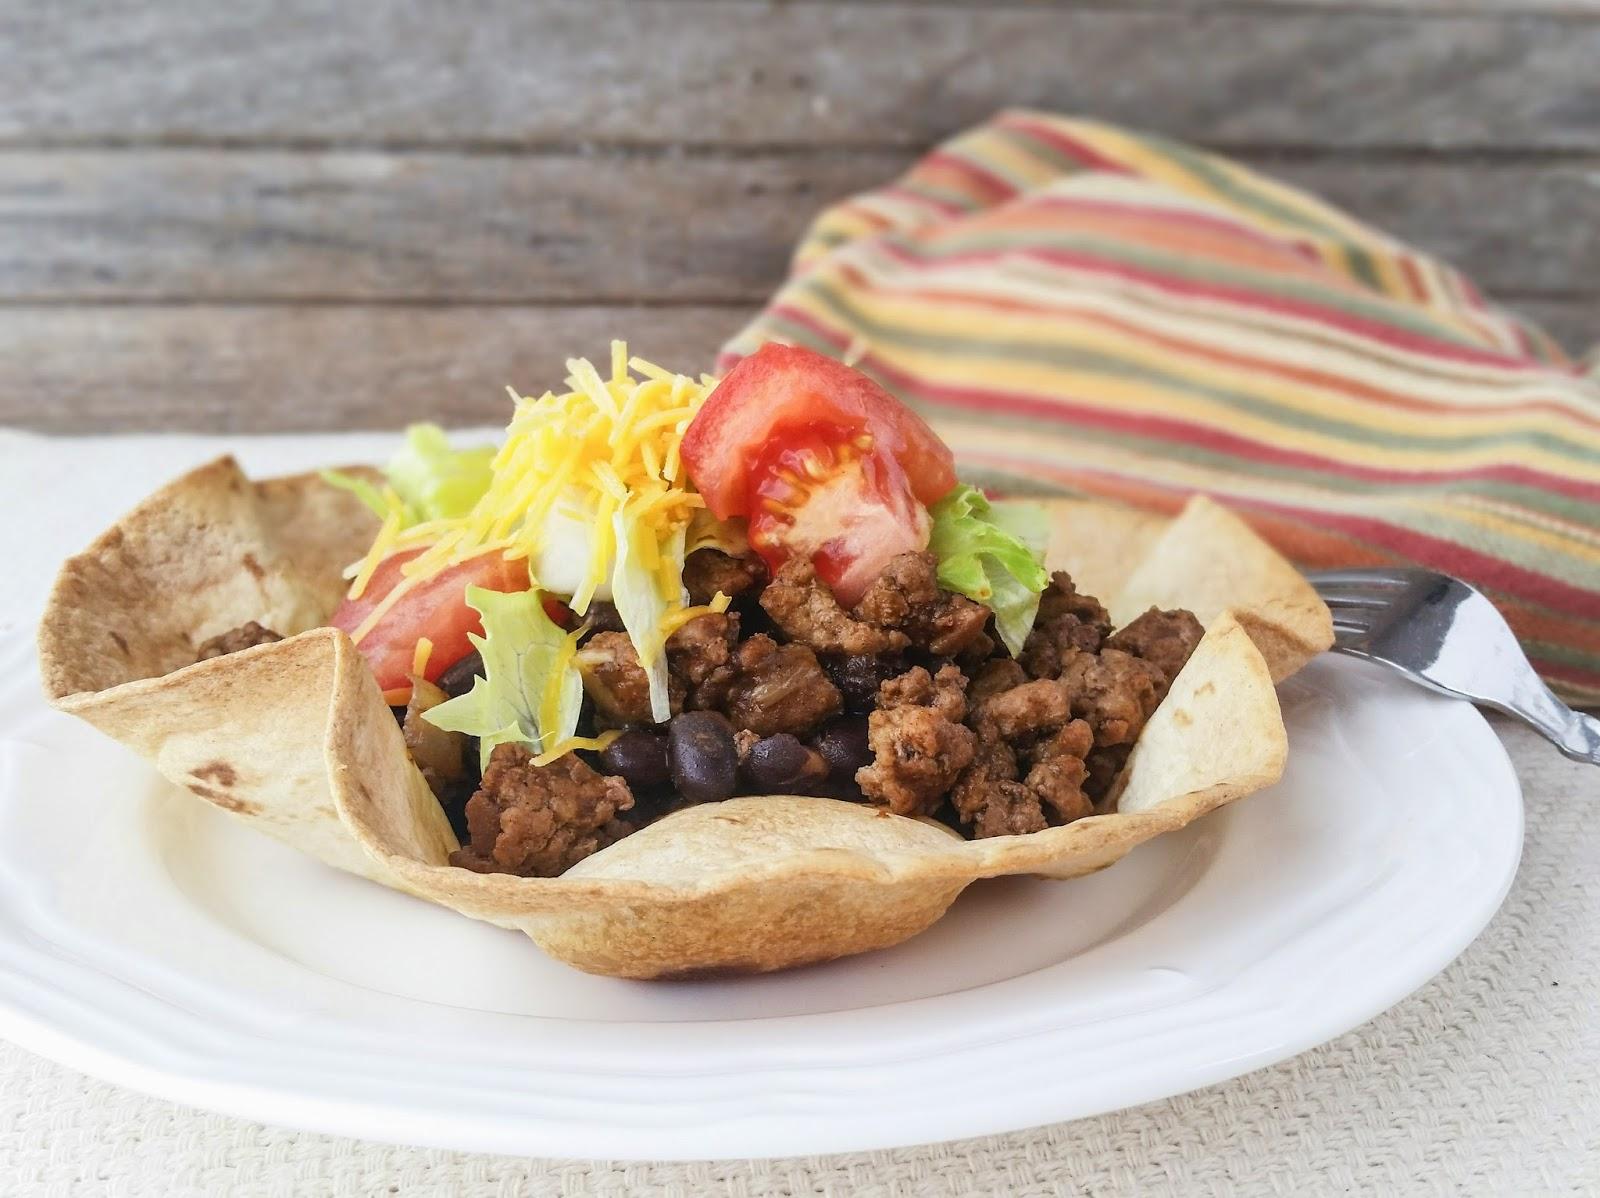 Turkey and Black Bean Taco Bowls